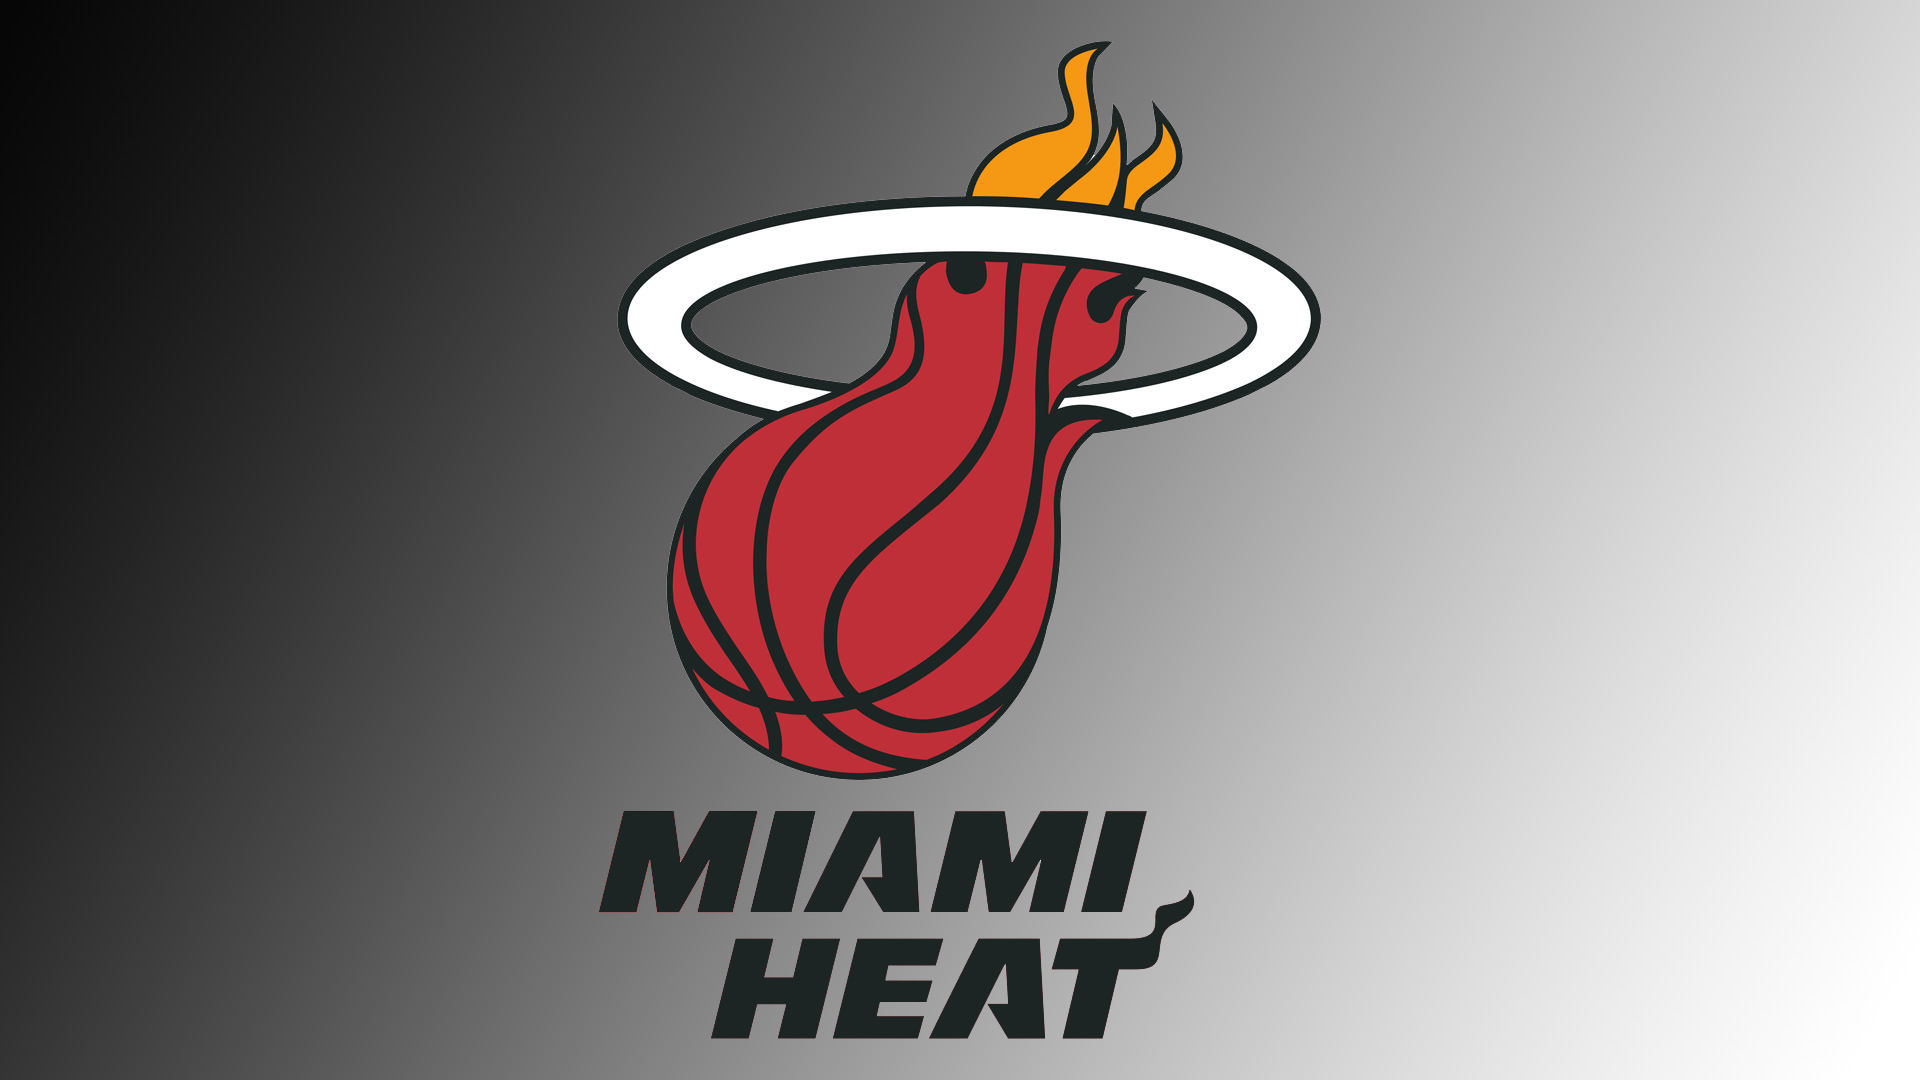 Miami Heat Logo Wallpaper Peinture 1920x1080